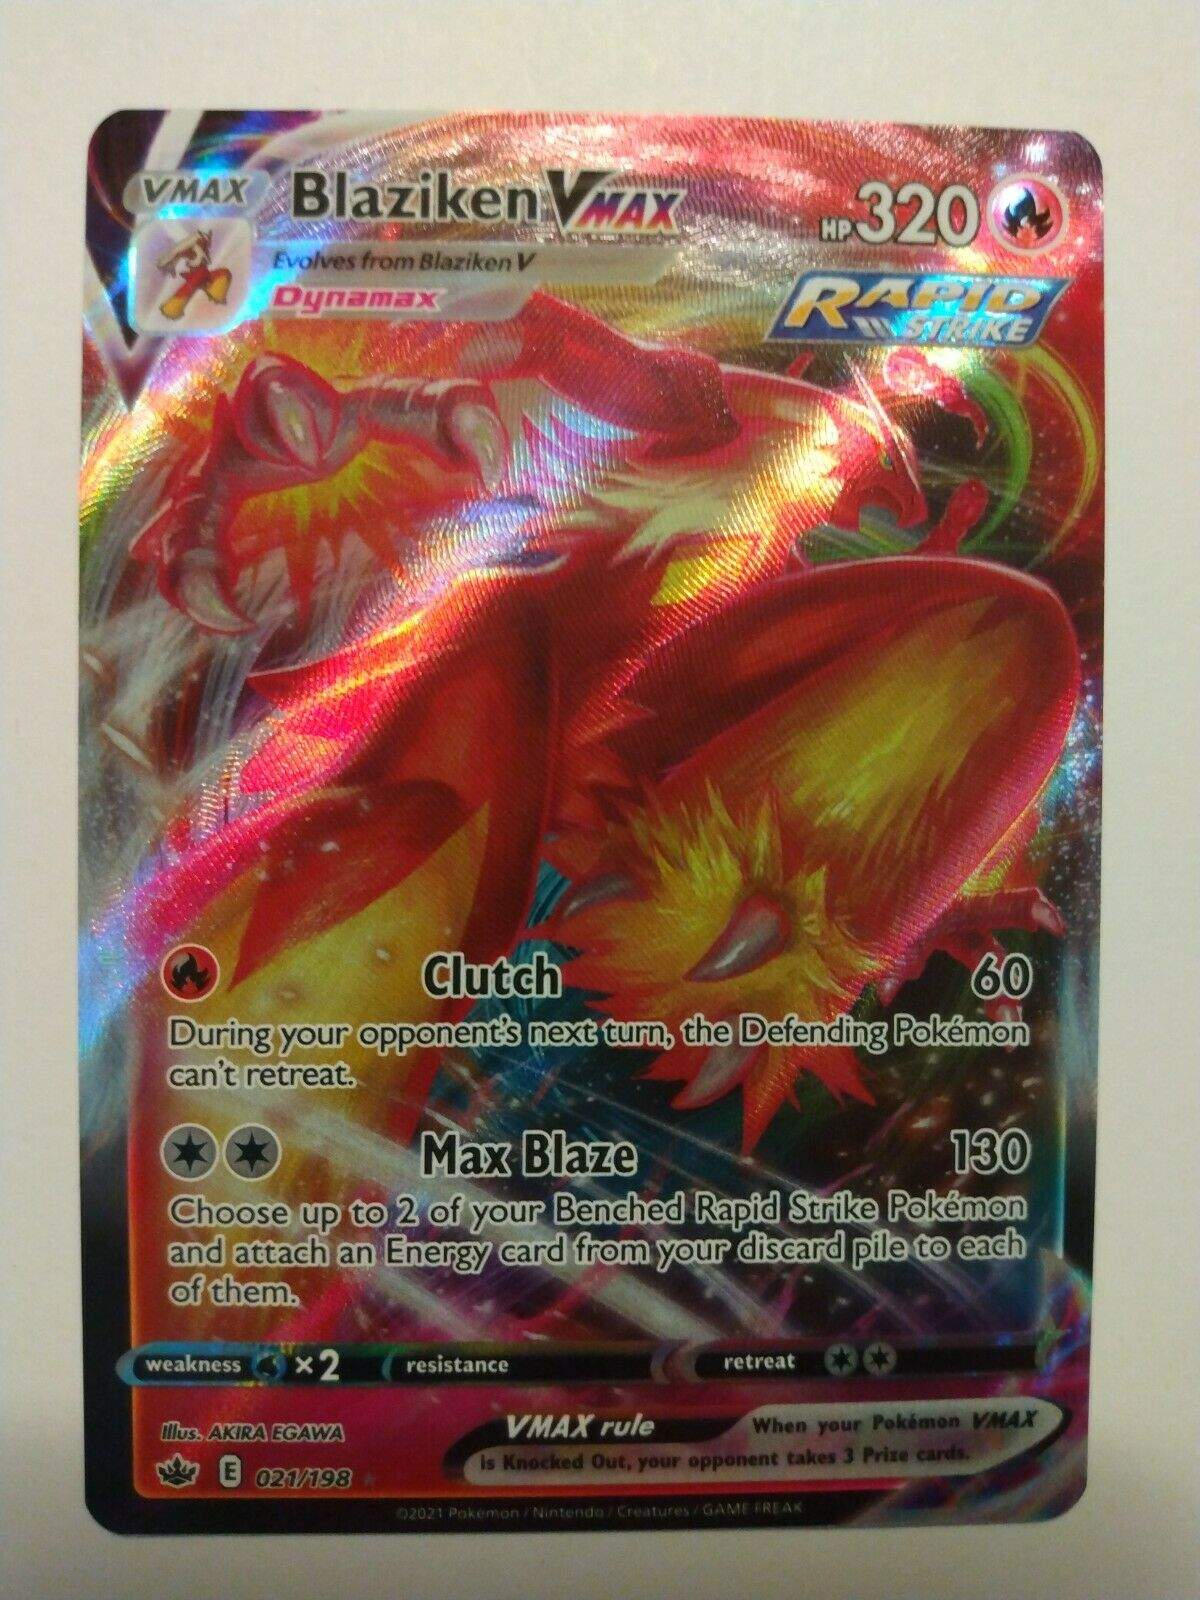 Pokemon - Blaziken Vmax - 021/198 - Full Art - Chilling Reign - NM/M - New - Image 1